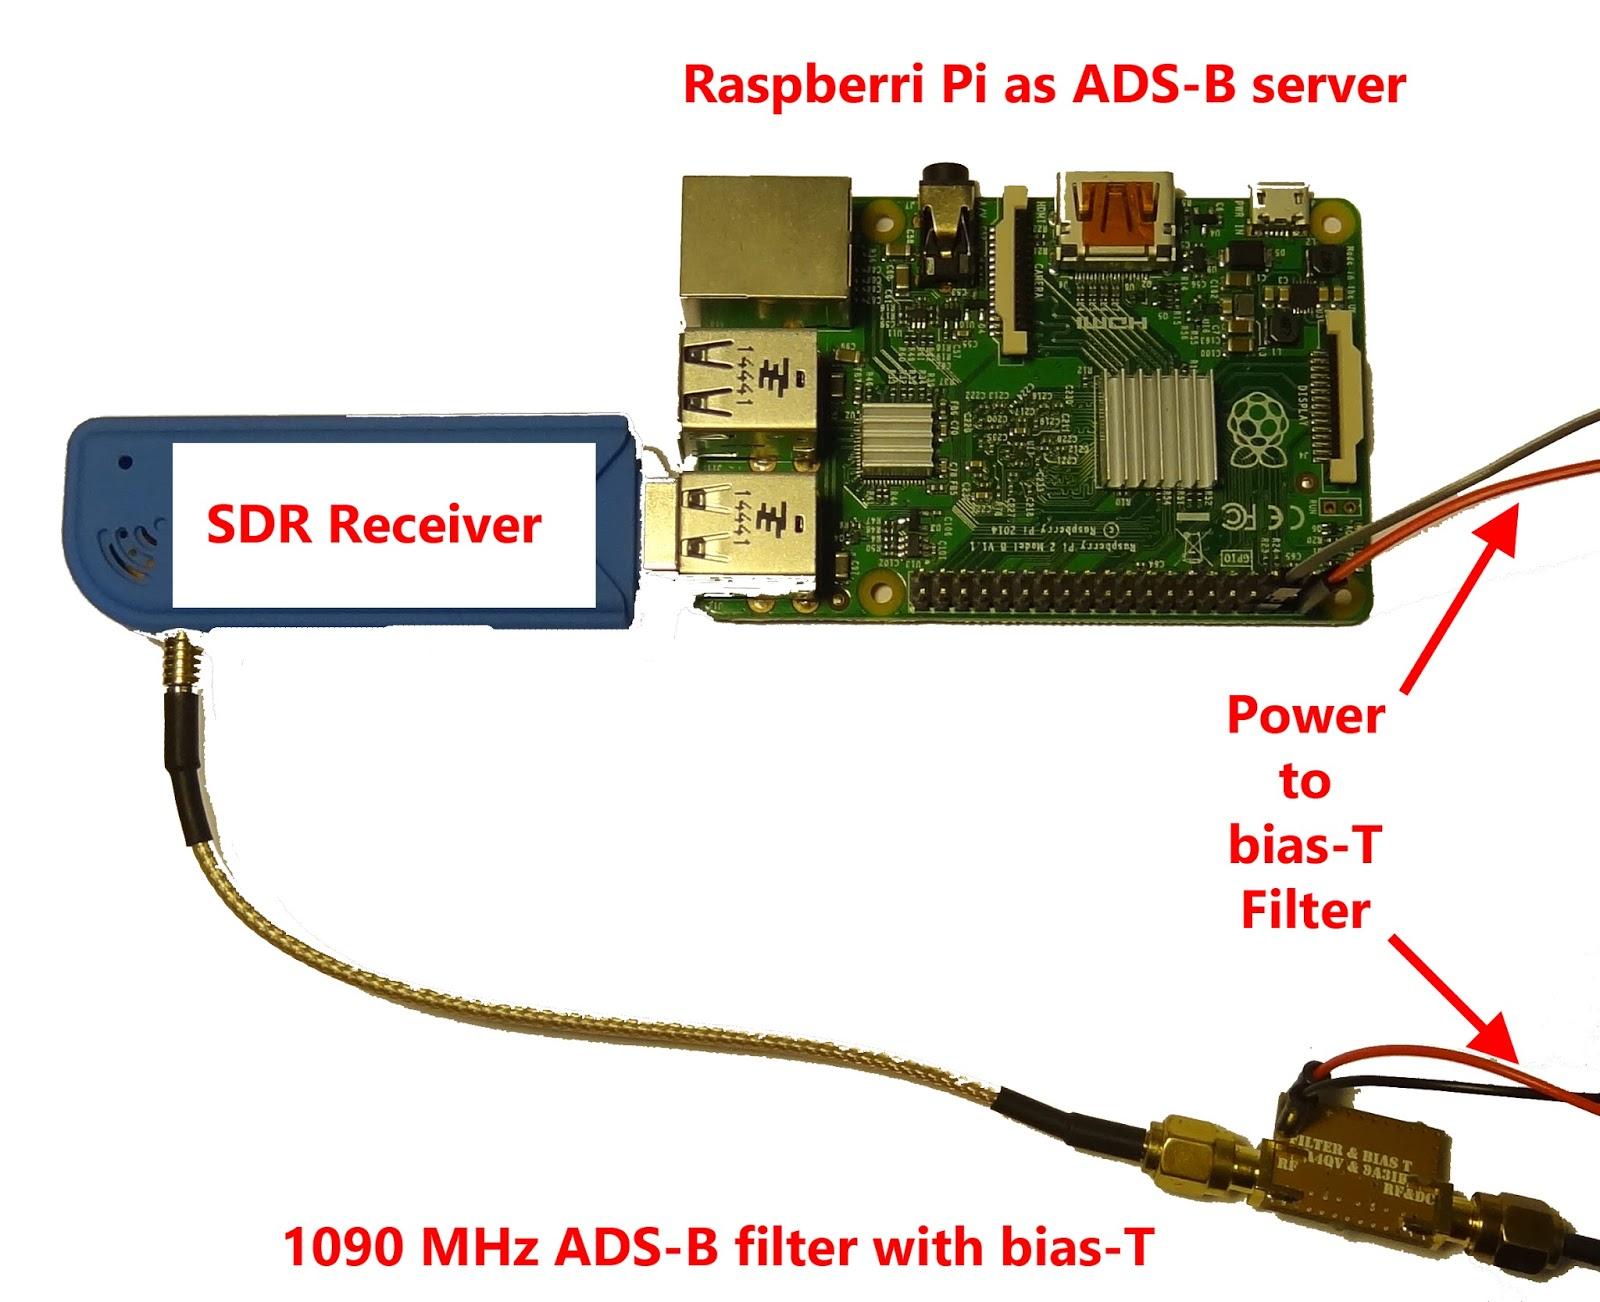 ads b receiver block diagram rtlsdr4everyone    ads       b    bias t filter and external  rtlsdr4everyone    ads       b    bias t filter and external